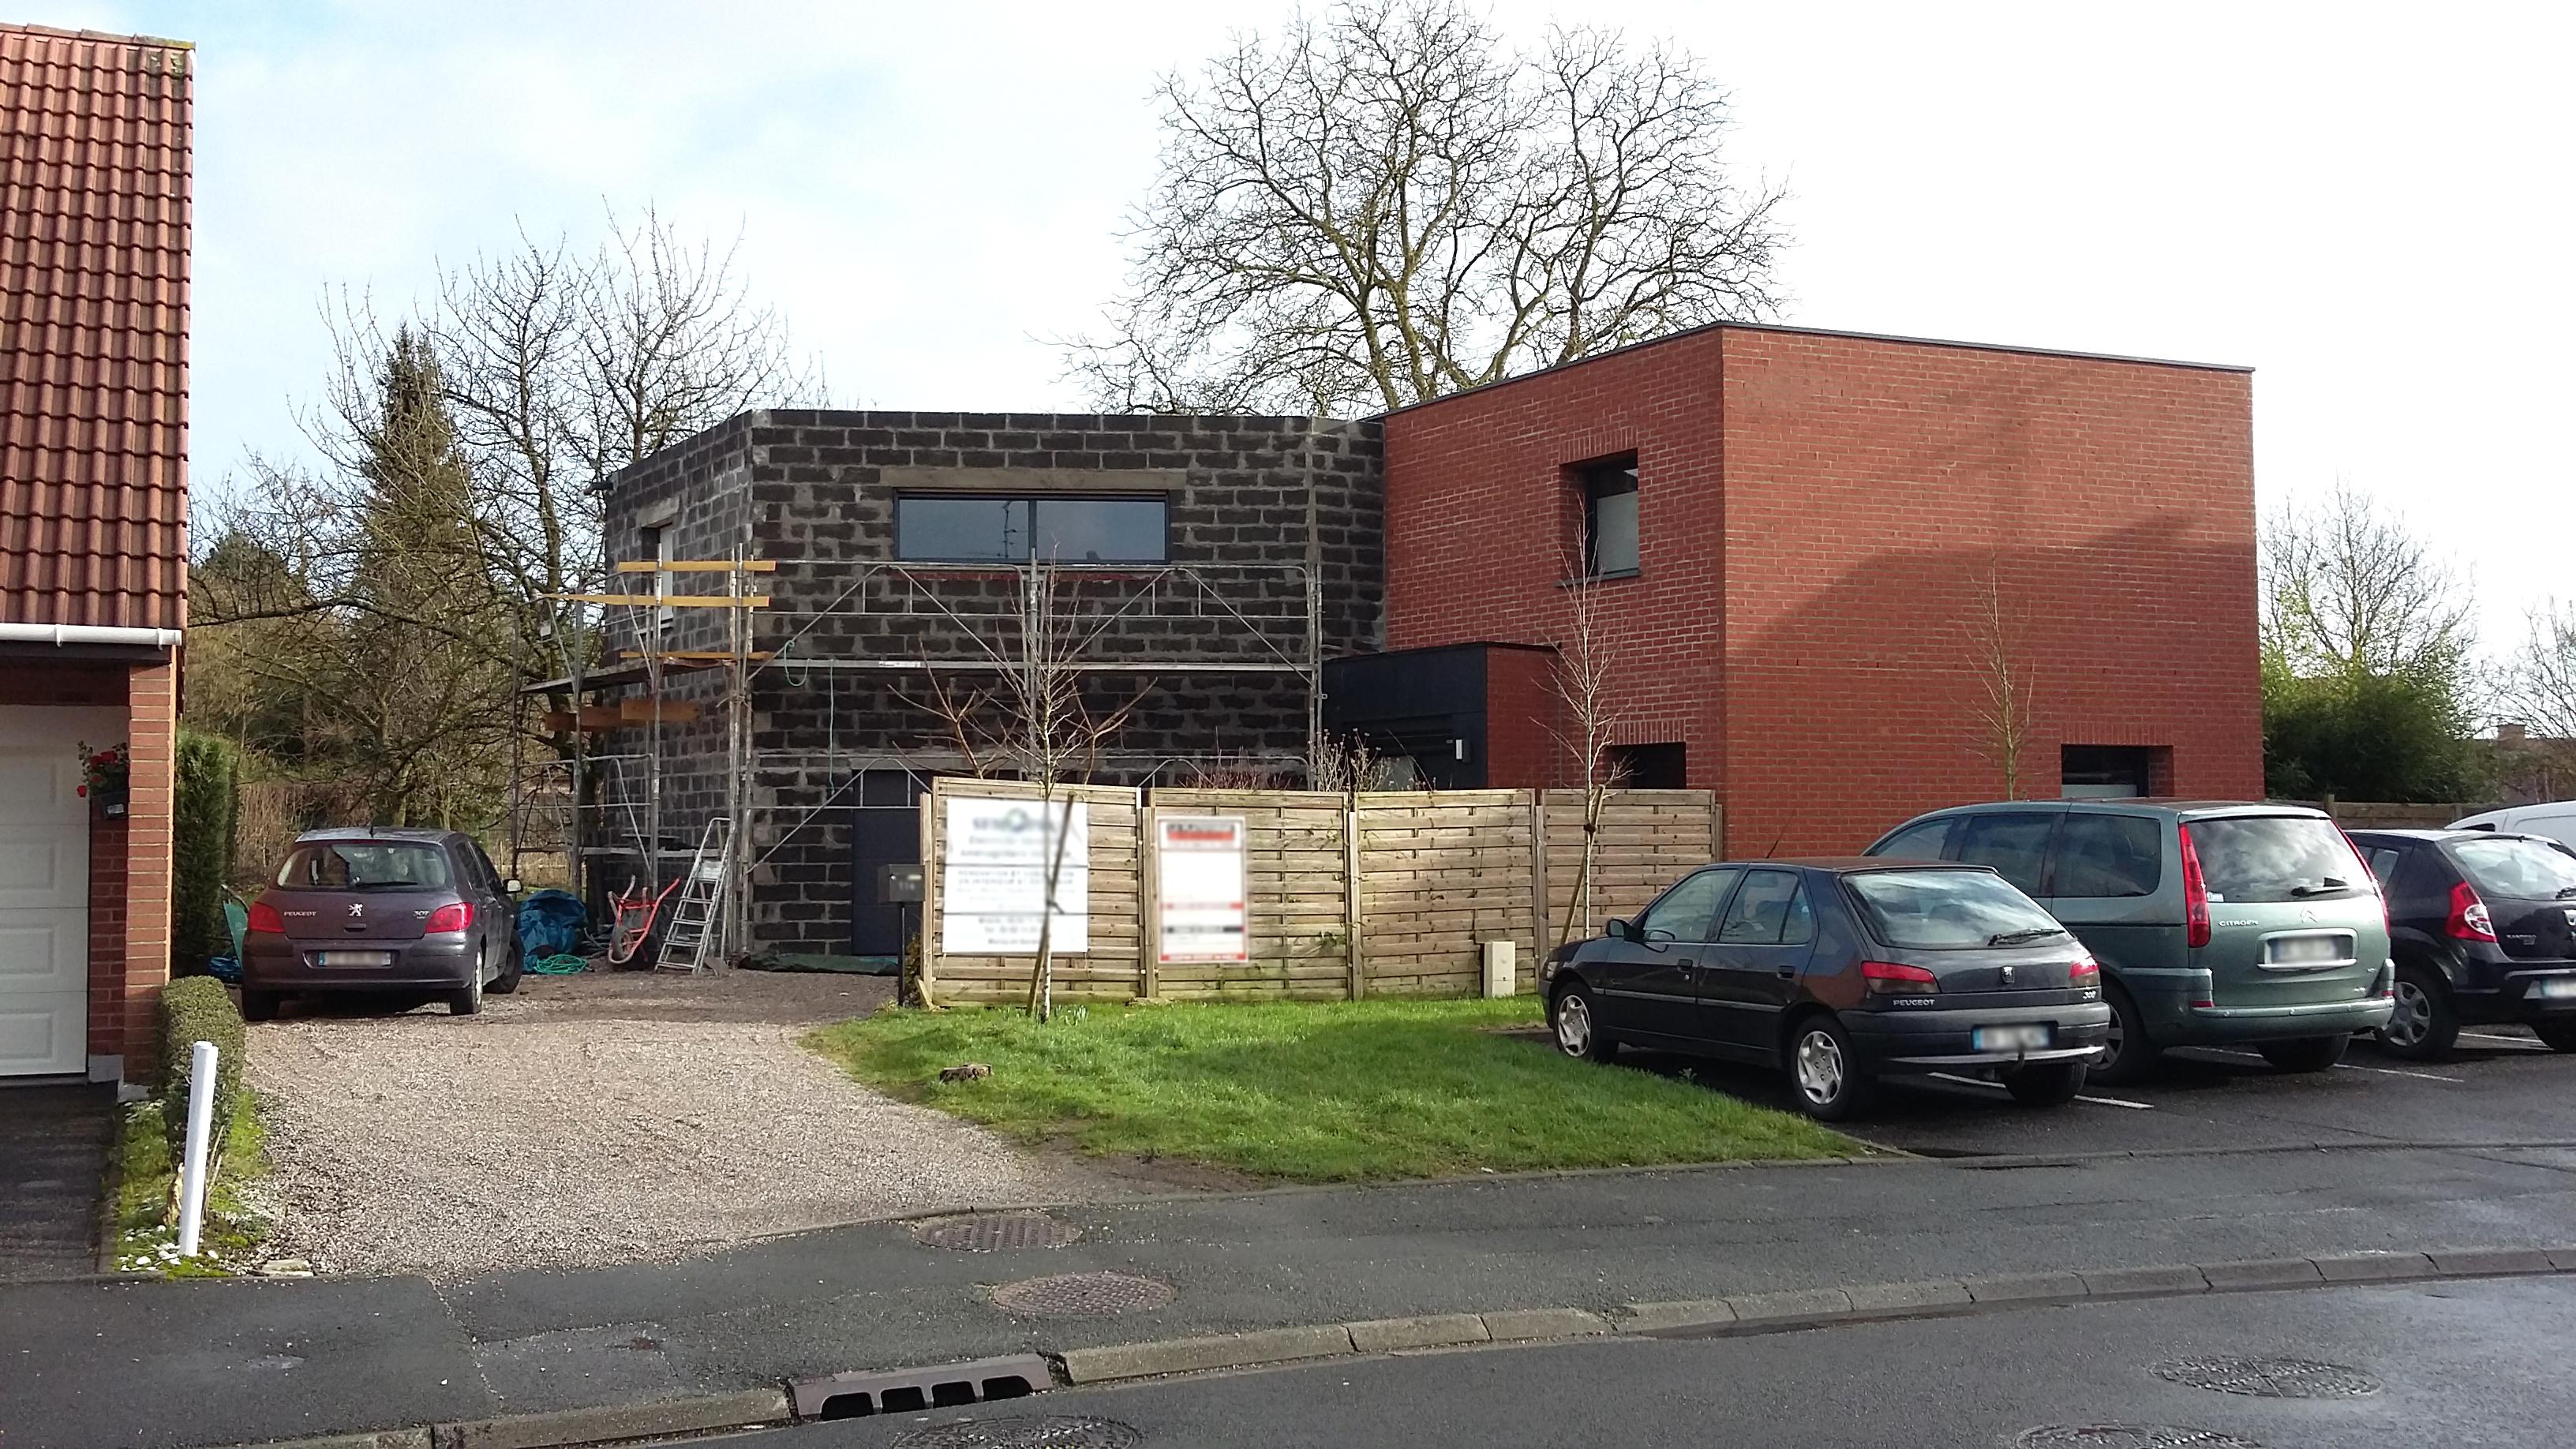 15.38 Atelier Permis de construire extension nord Cysoing6.1